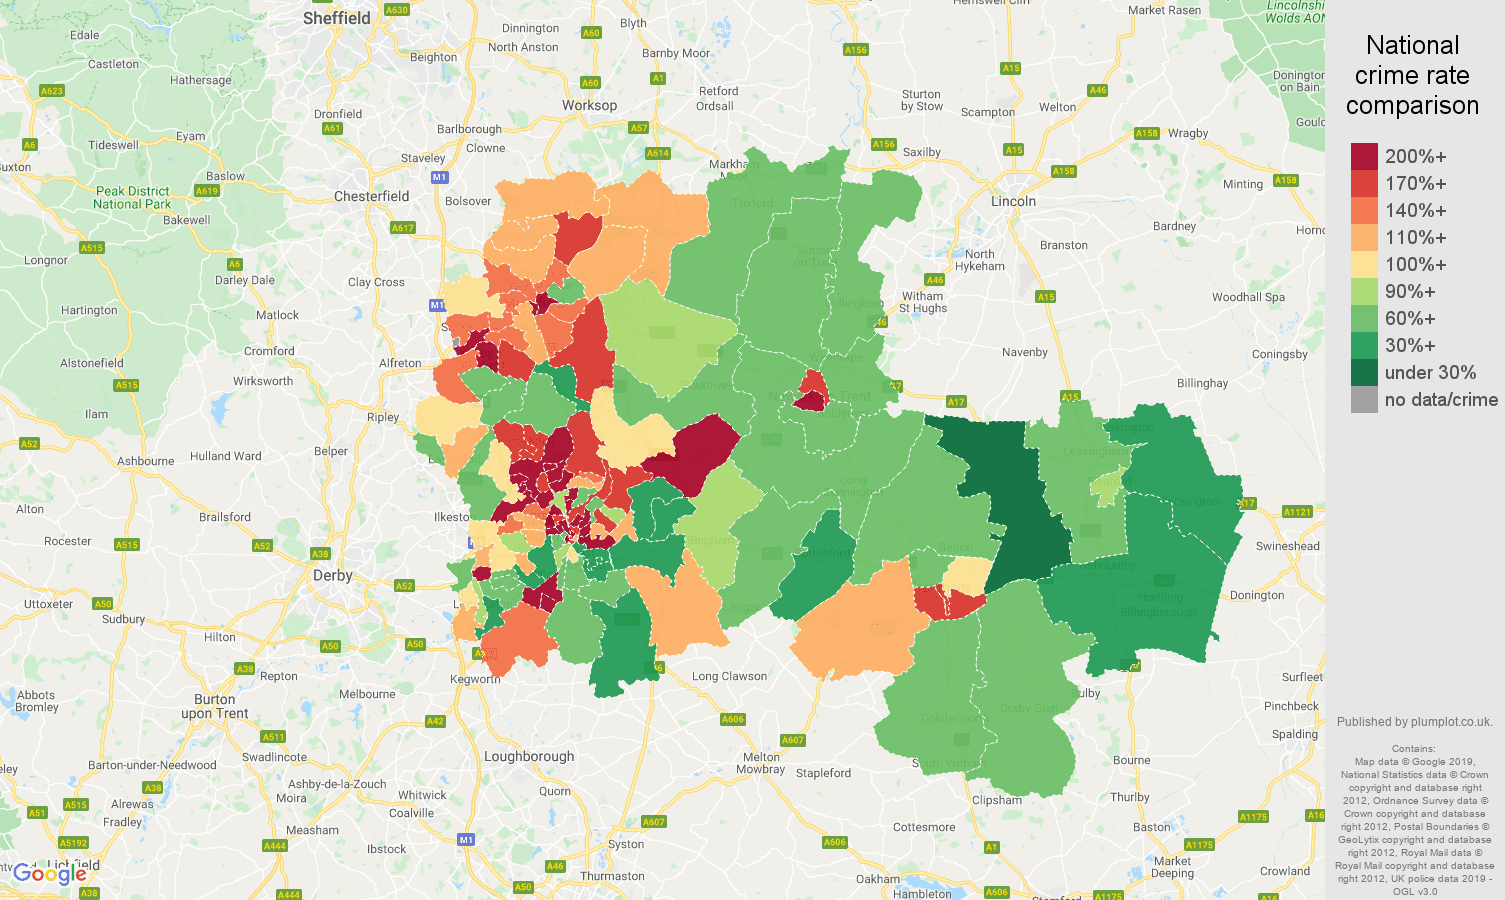 Nottingham other crime rate comparison map